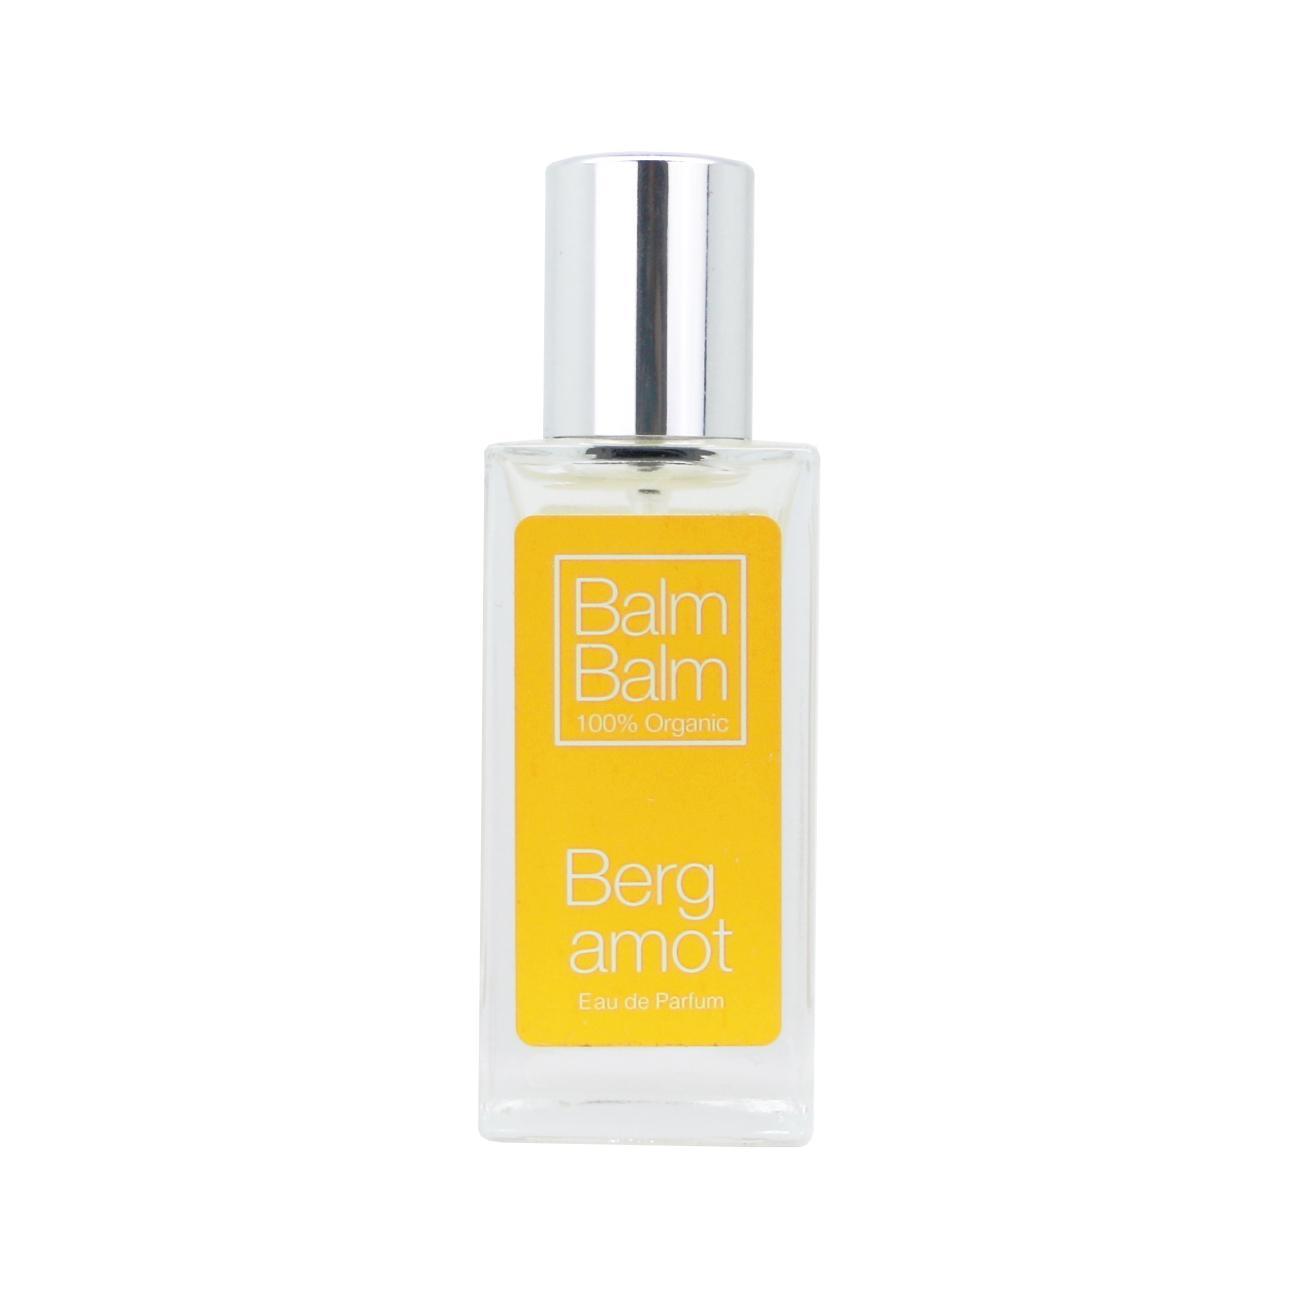 Balm Balm Single note Bergamot Eau de Parfum 33 ml